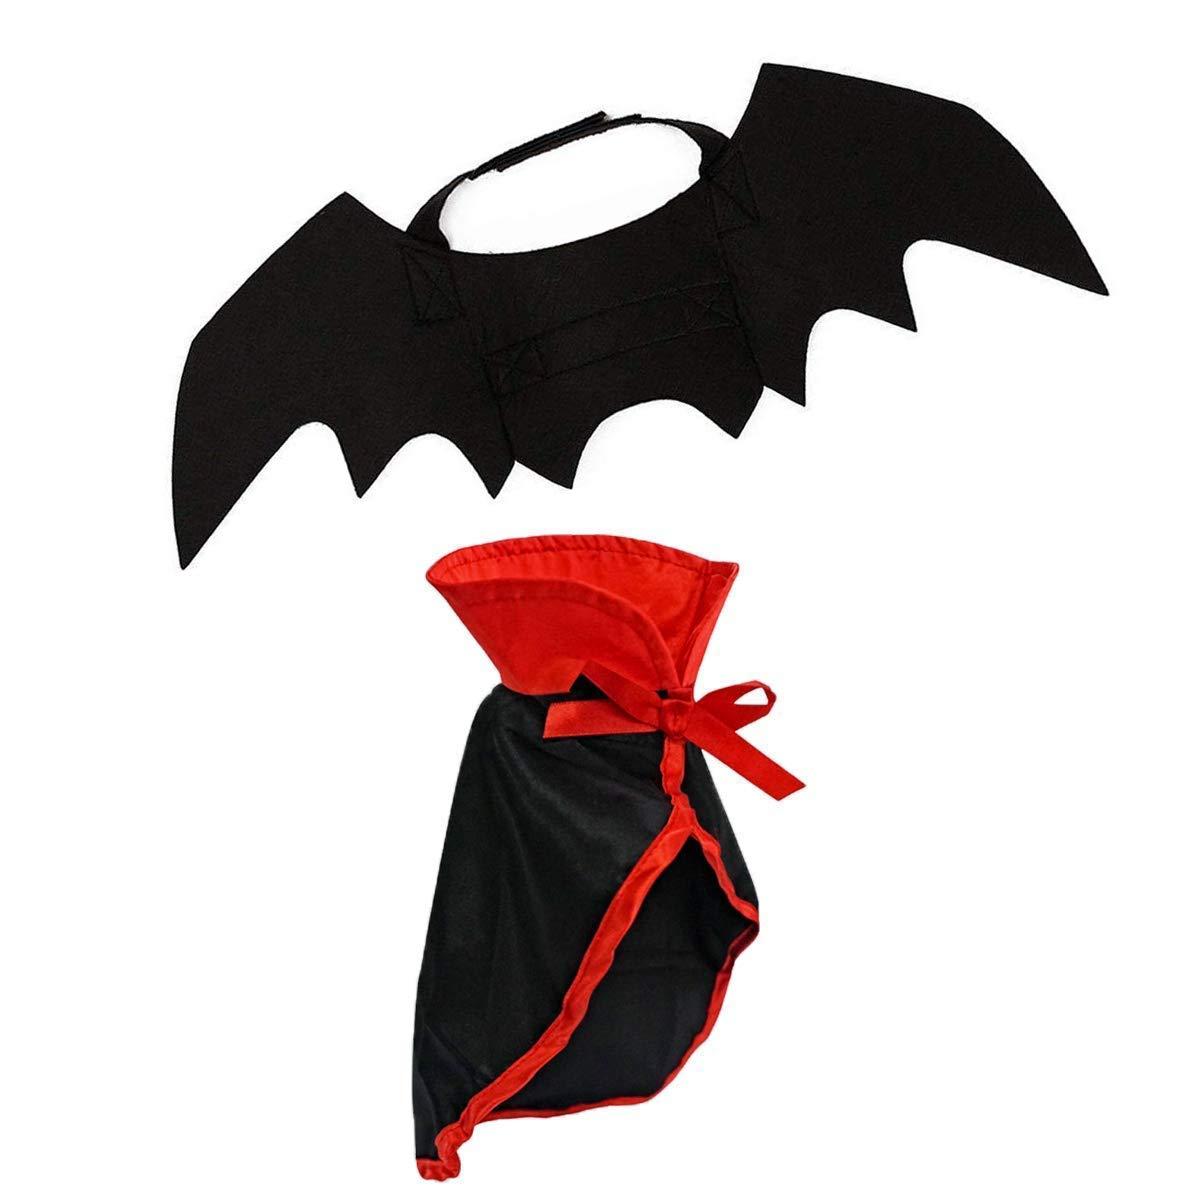 Amazon.com : lcfun Cat Costume Halloween- Pet Cape & Bat Wings 2 PCS Small Dogs Kitten-Pet Clothes Cloak Christmas Holiday Cosplay Party : Pet Supplies